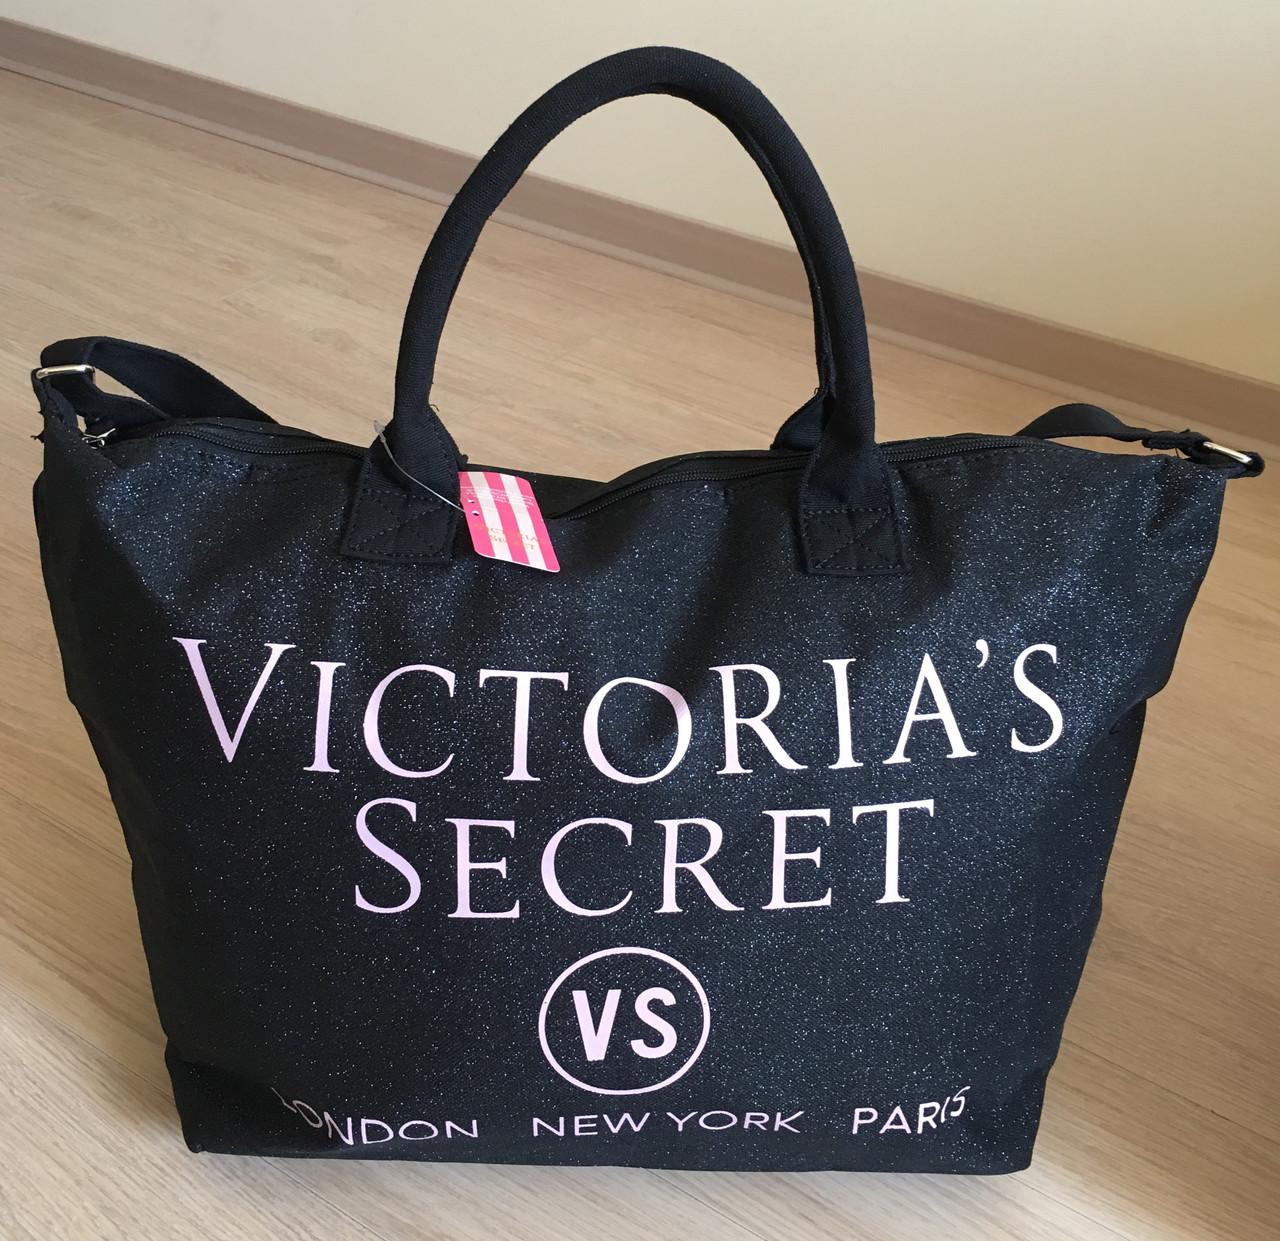 3a7dd5ca8028 Сумка пляжная Victoria s Secret - Интернет-магазин